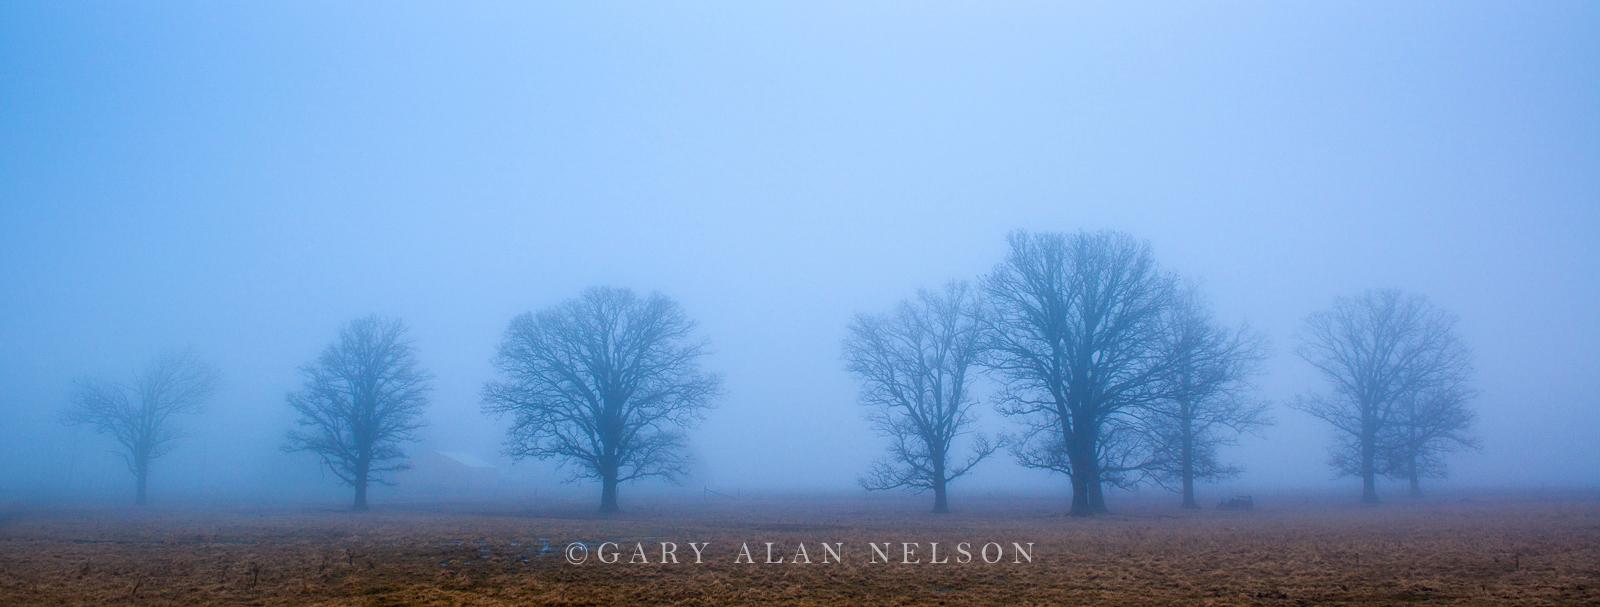 Oak trees outstanding in fog, Chisago County, Minnesota